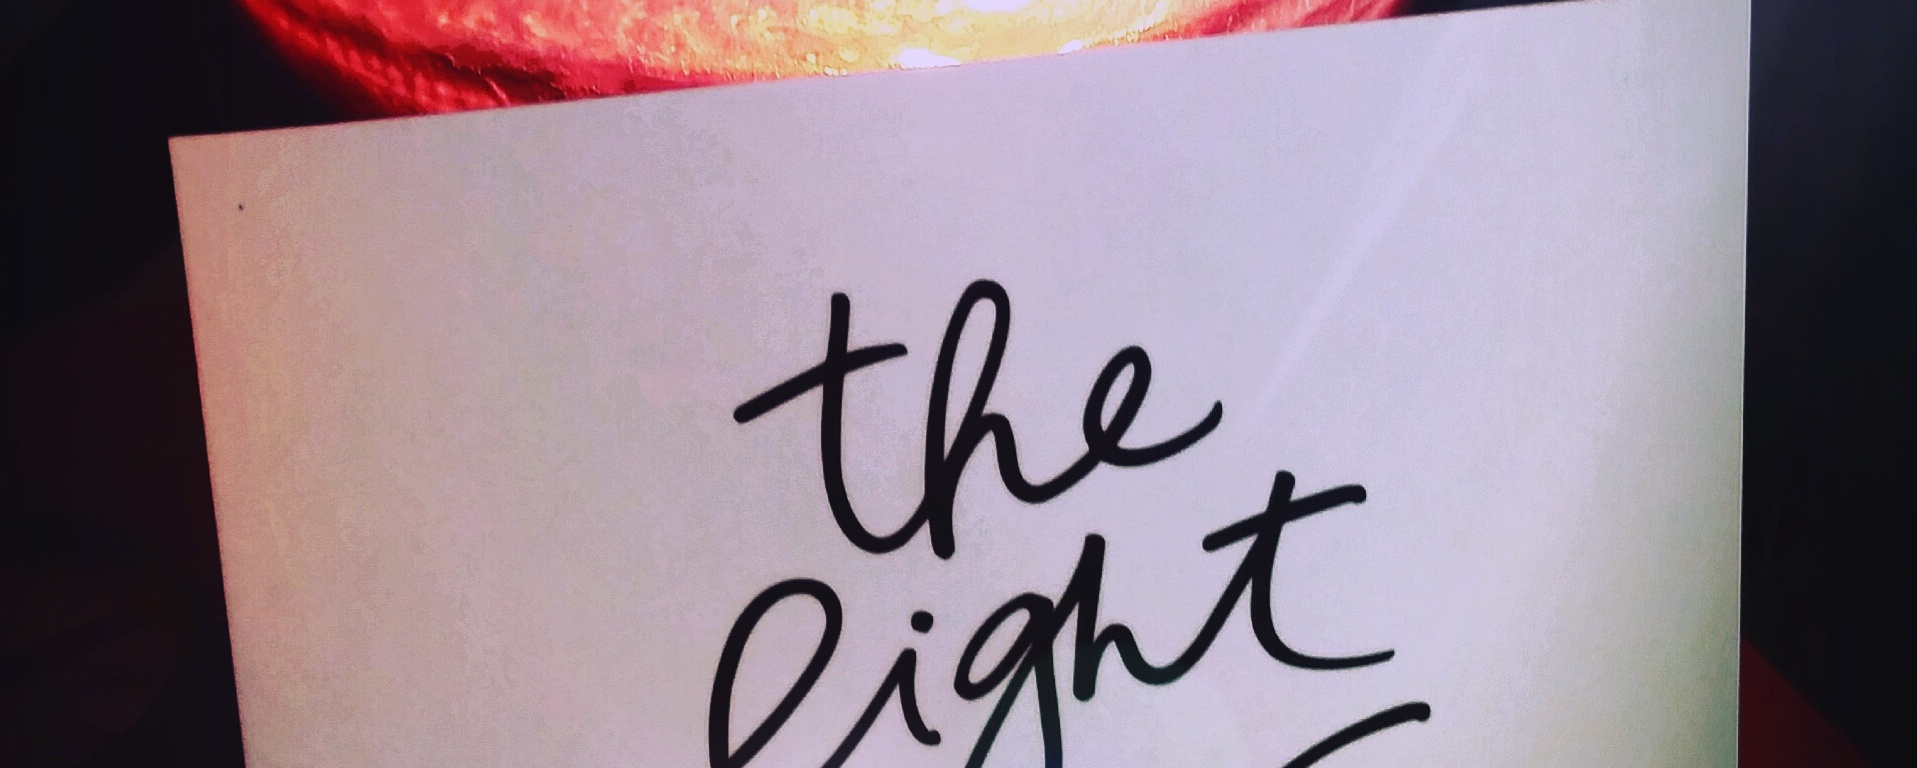 truthbomb-light-inspiration-danielle-laporte